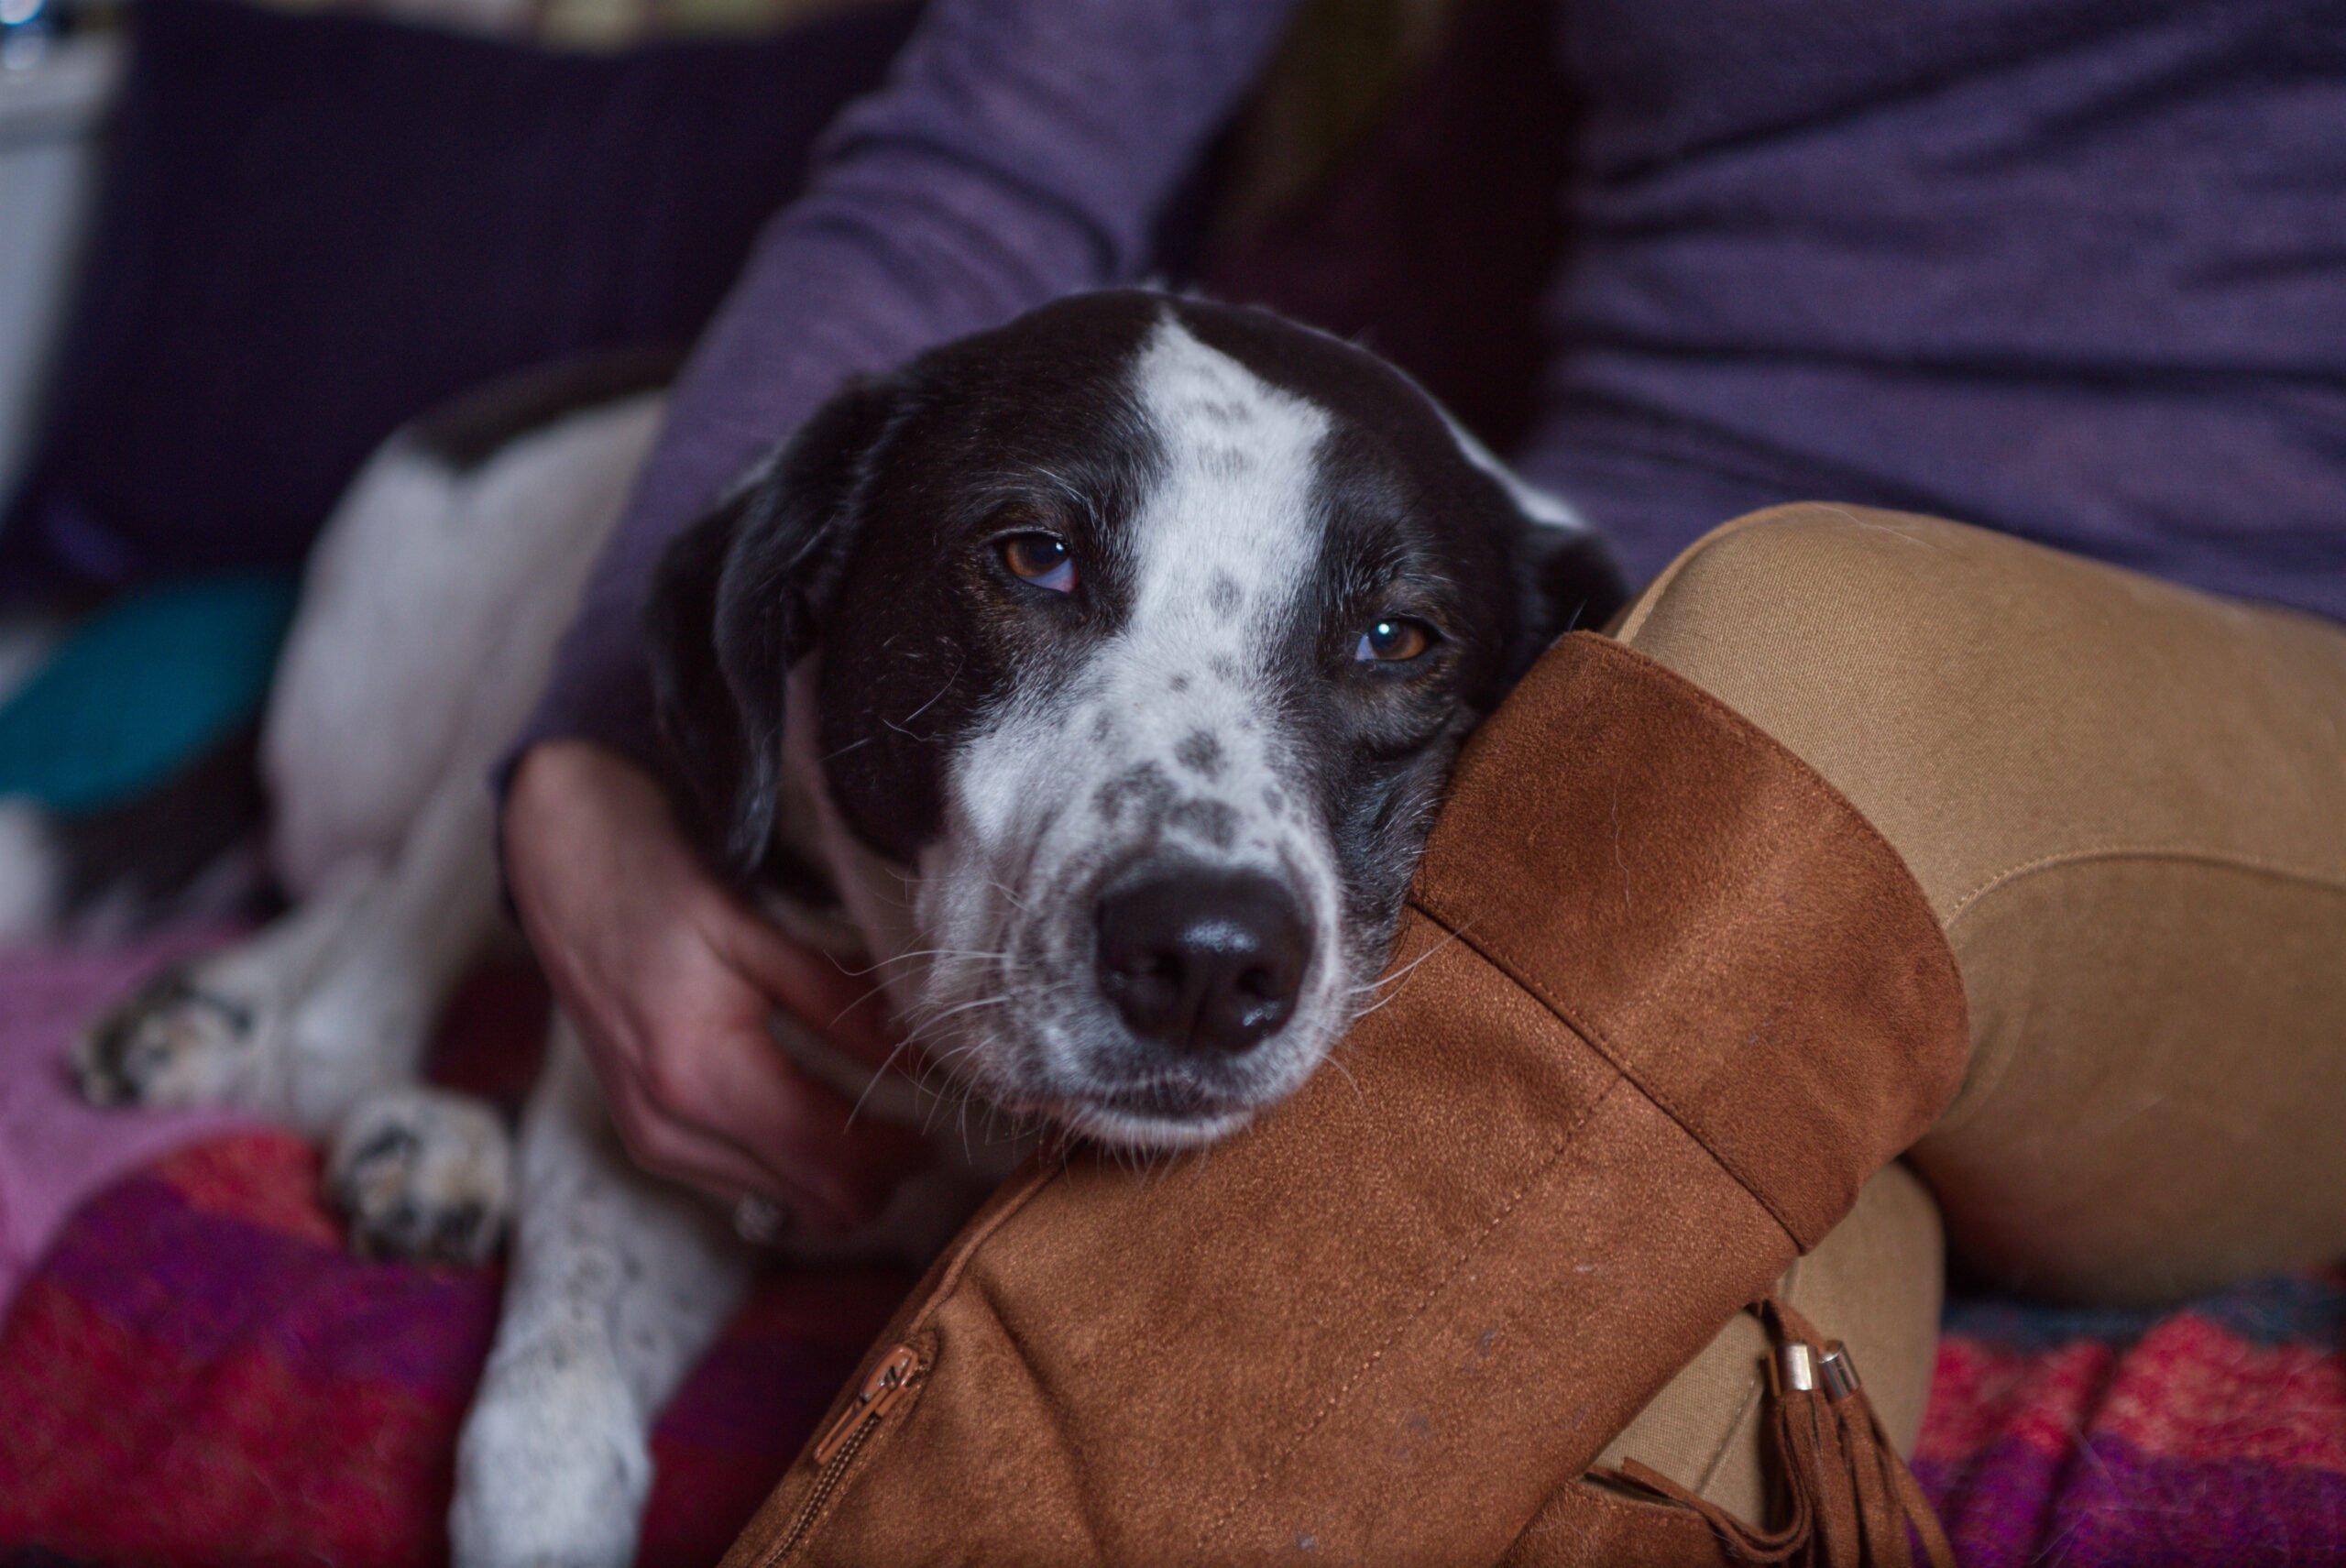 Ruth Doolittle Animal Communicator with Marshall her dog